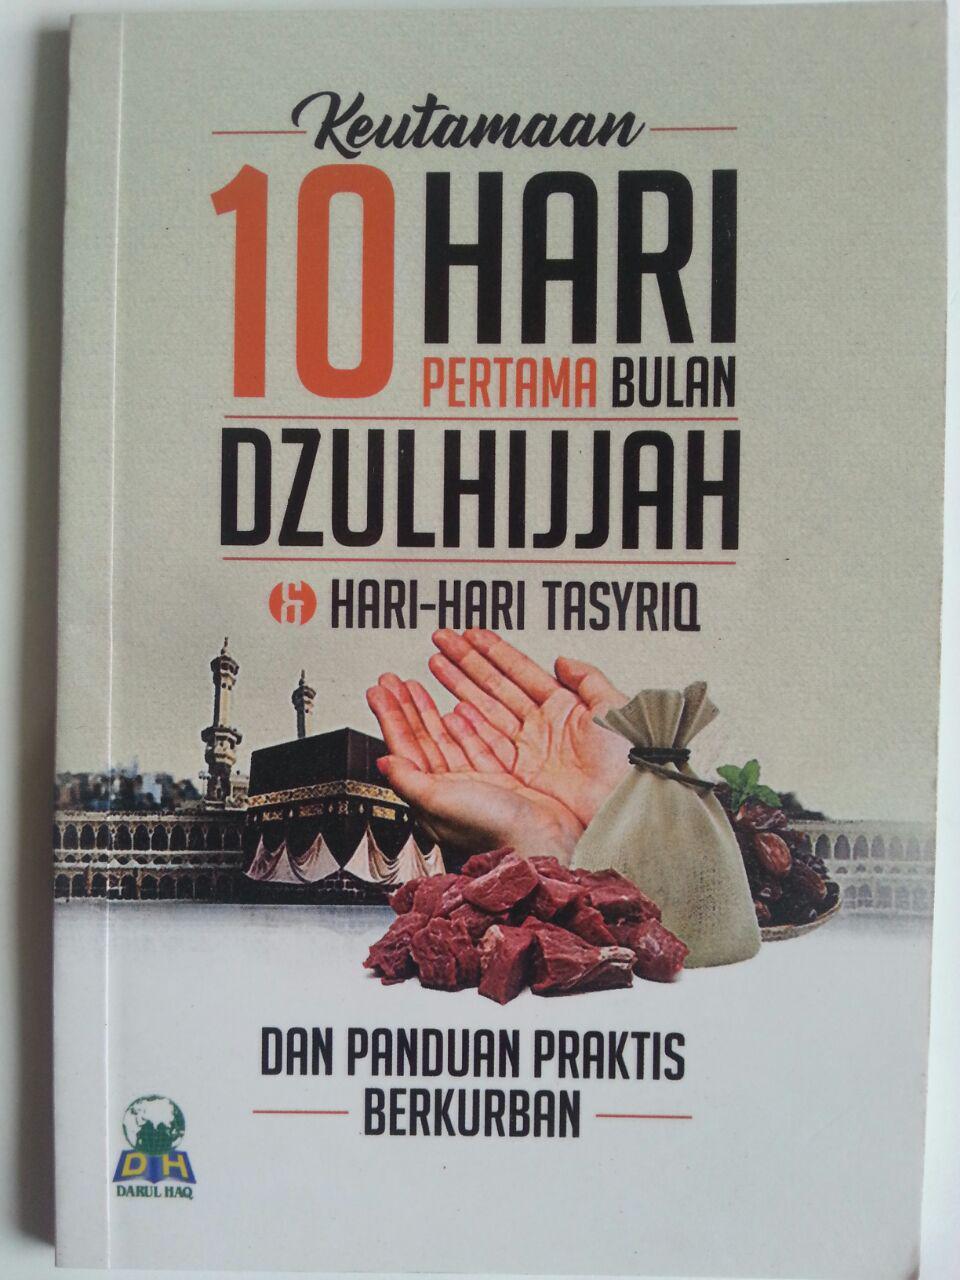 Buku Saku Keutamaan 10 Hari Pertama Bulan Dzulhijjah Tasyriq Kurban cover 2